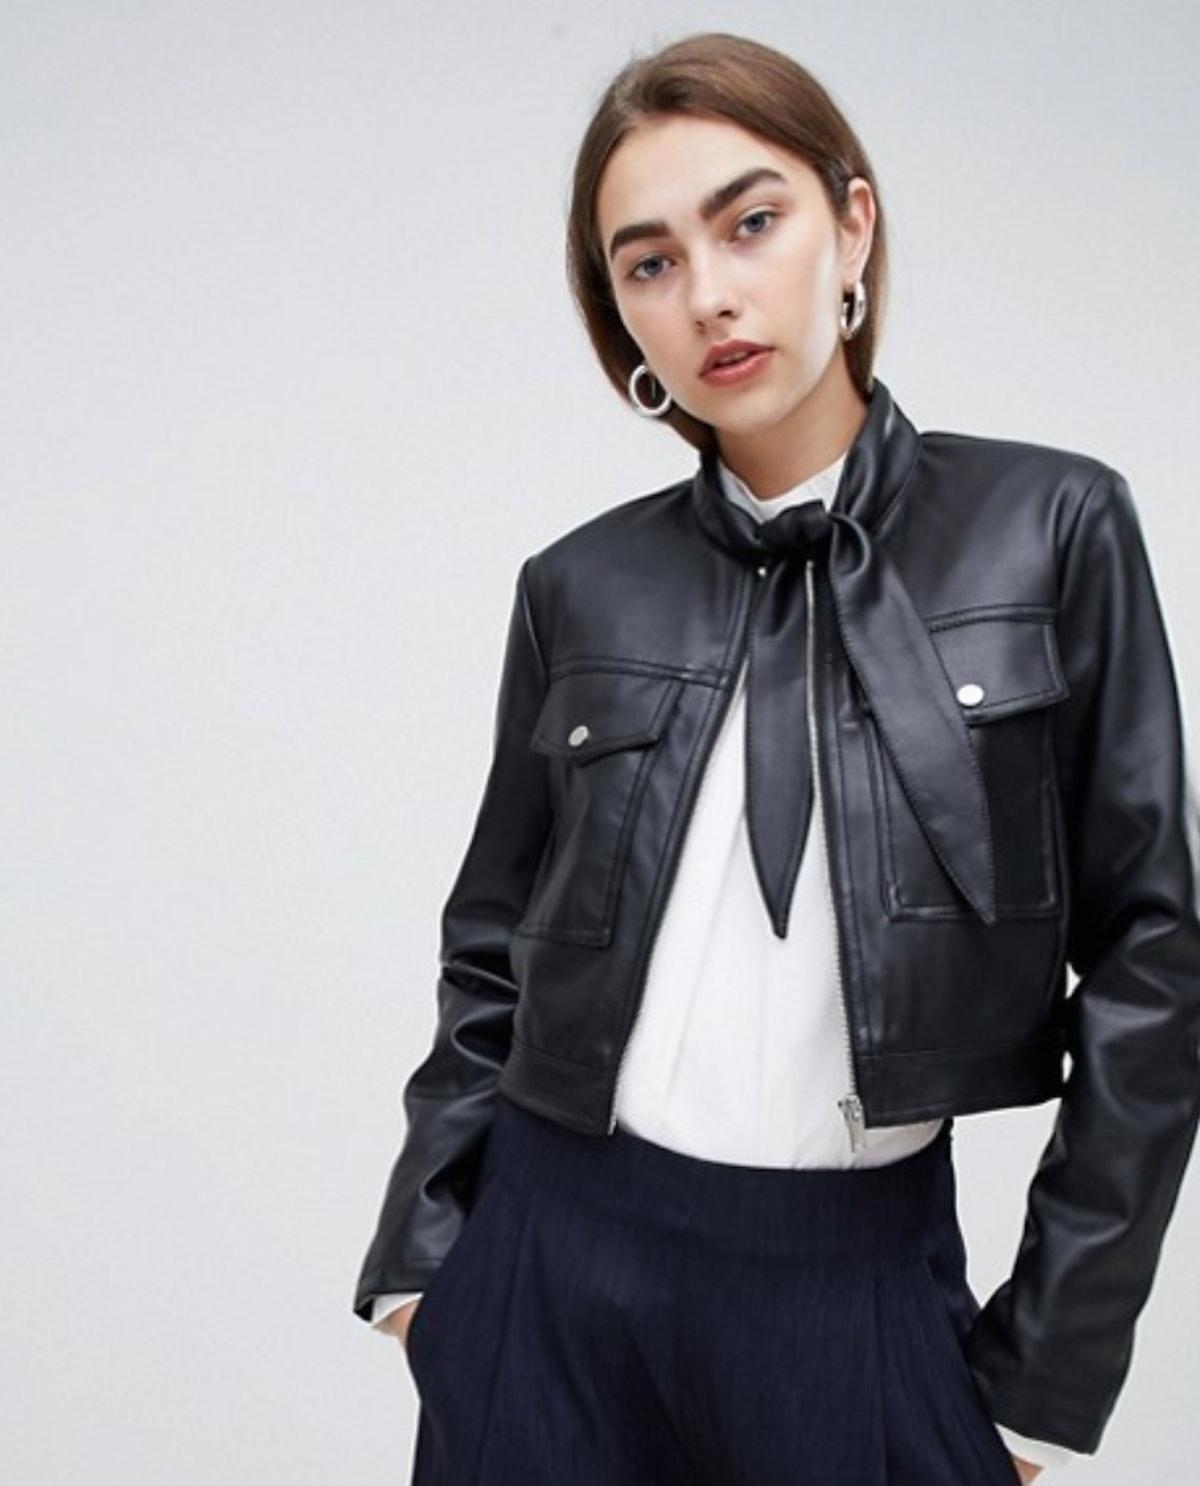 ASOS DESIGN Tie Neck Leather Look Jacket